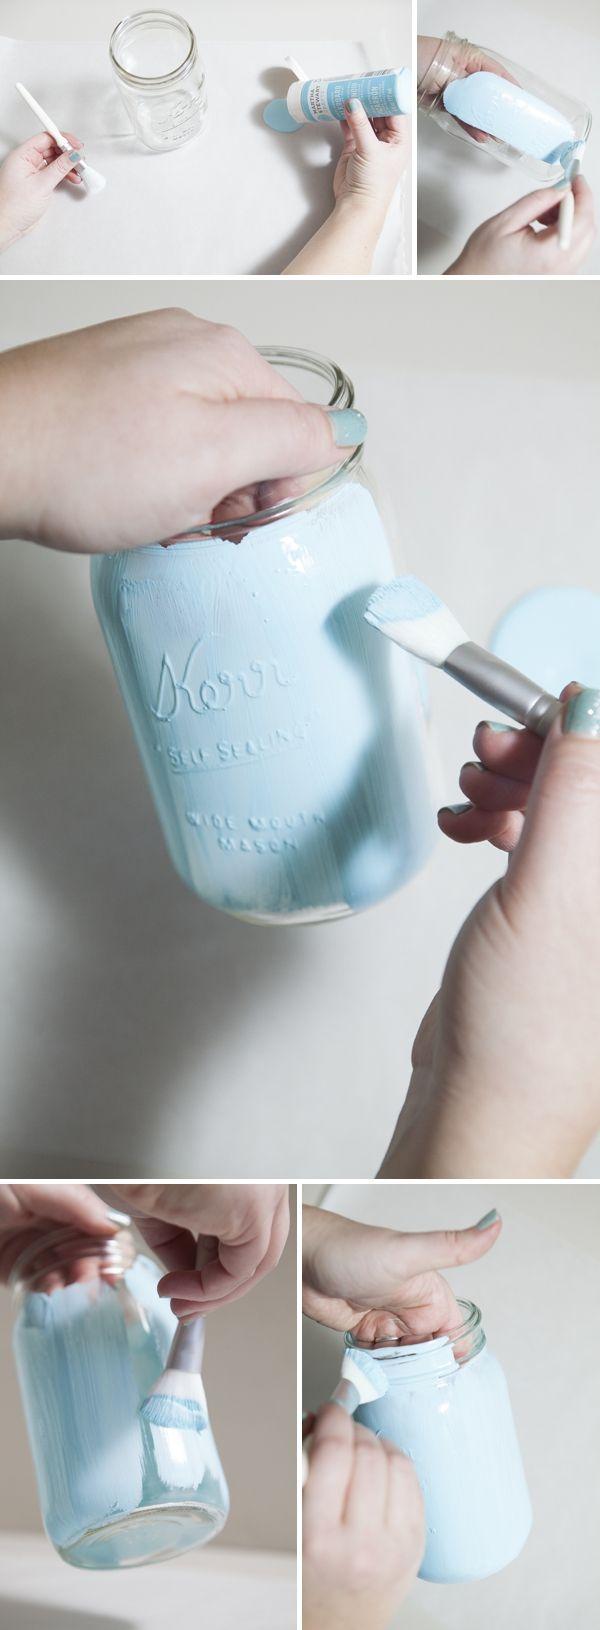 DIY Wedding // how to easily make distressed chalkboard mason jars for your rustic wedding decor! #somethingturquoise #12monthsofmartha